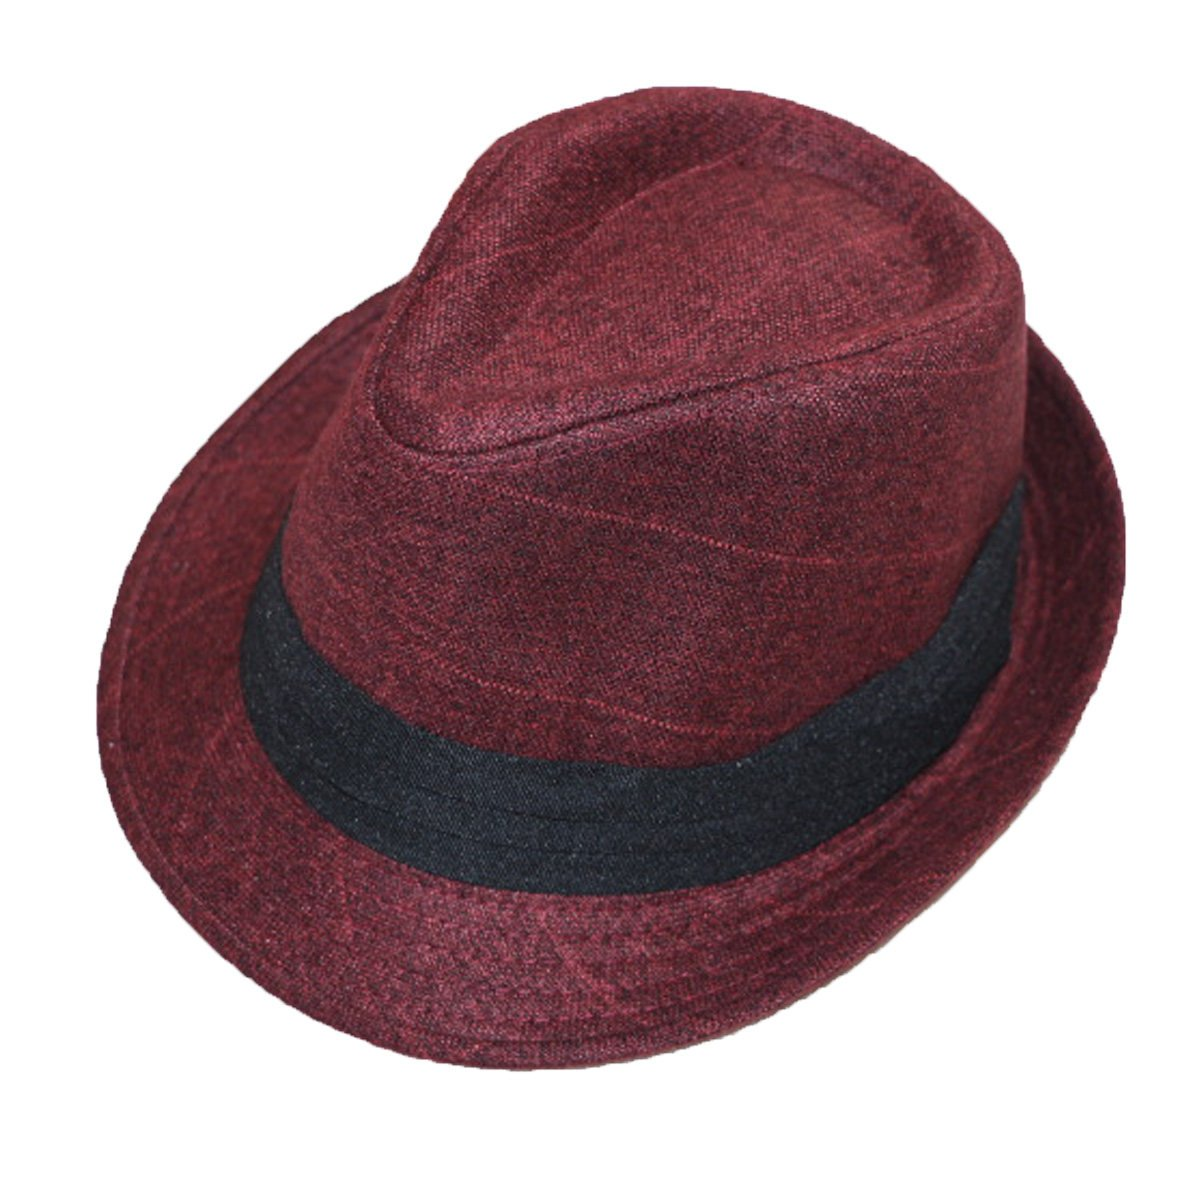 Unisex Fashion Warm Vintage Wool Fedoras Trilby Autumn Jazz Hat With Band Multicolor NIAISI